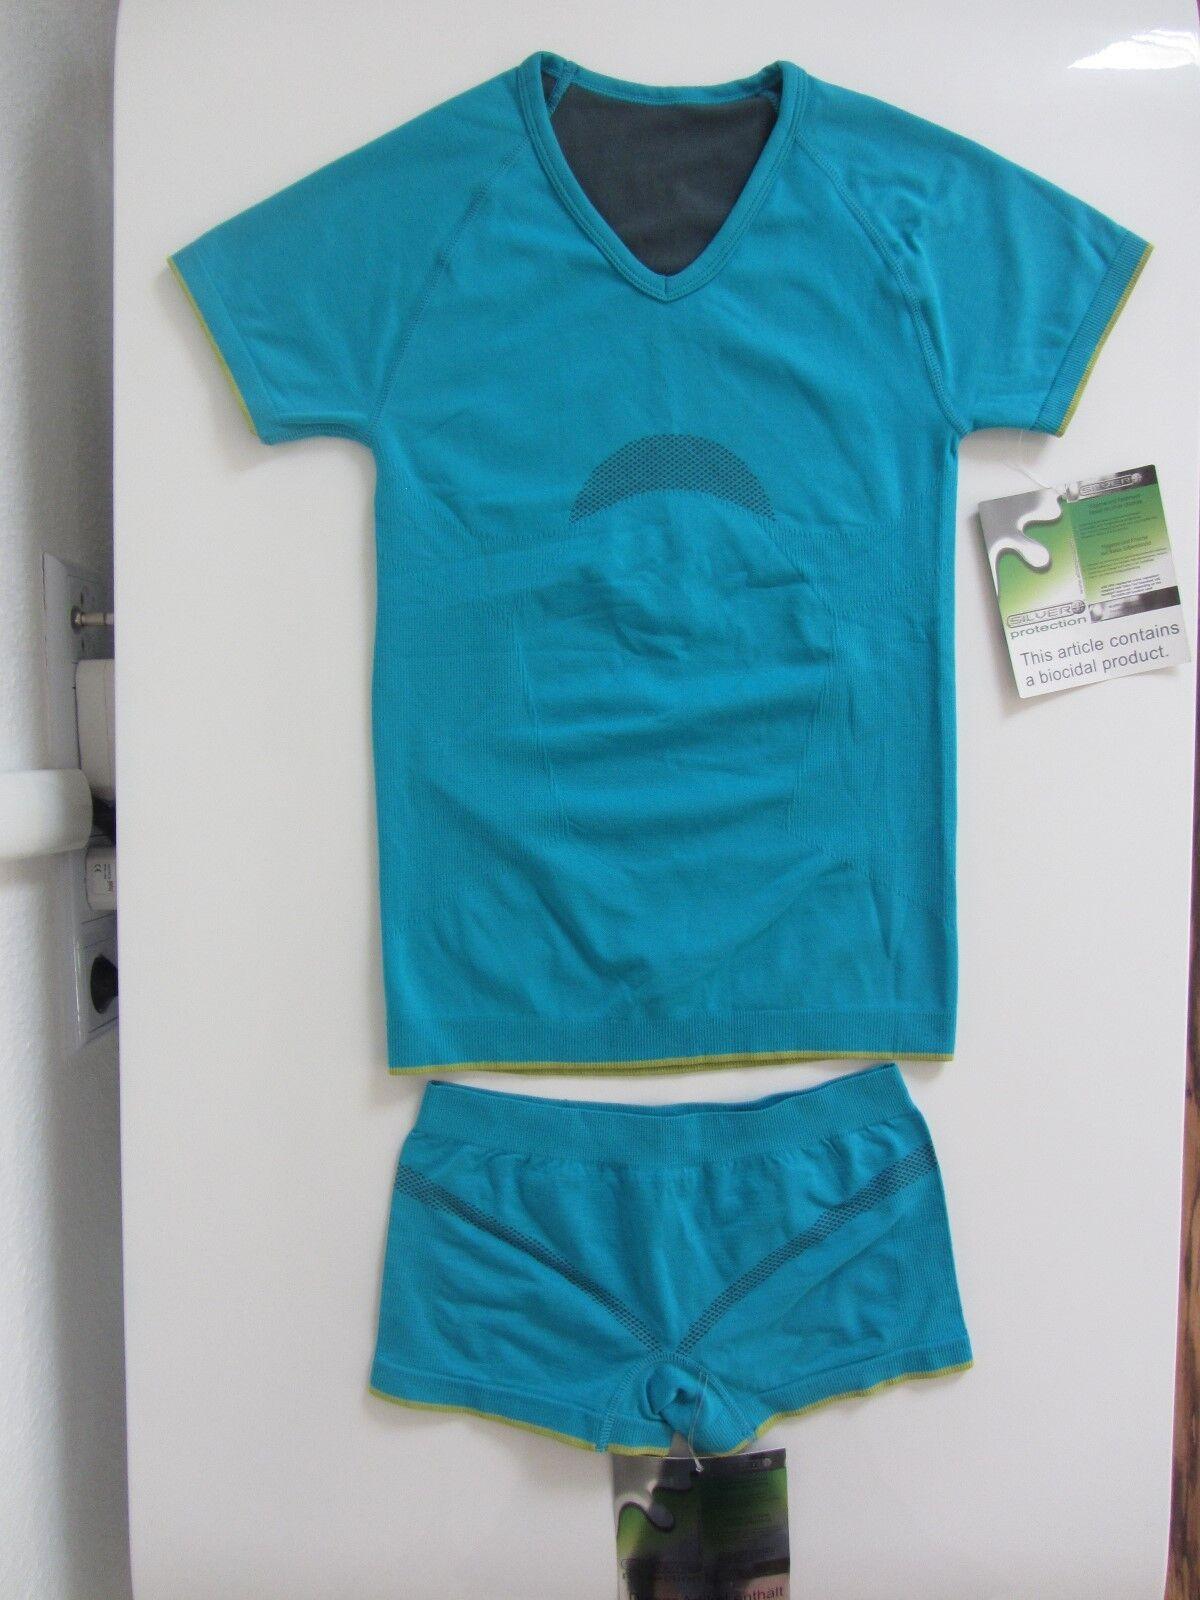 ACTIVE * Damen Funktions Shirt + Short * Gr. 36/38 * Joggen Laufe